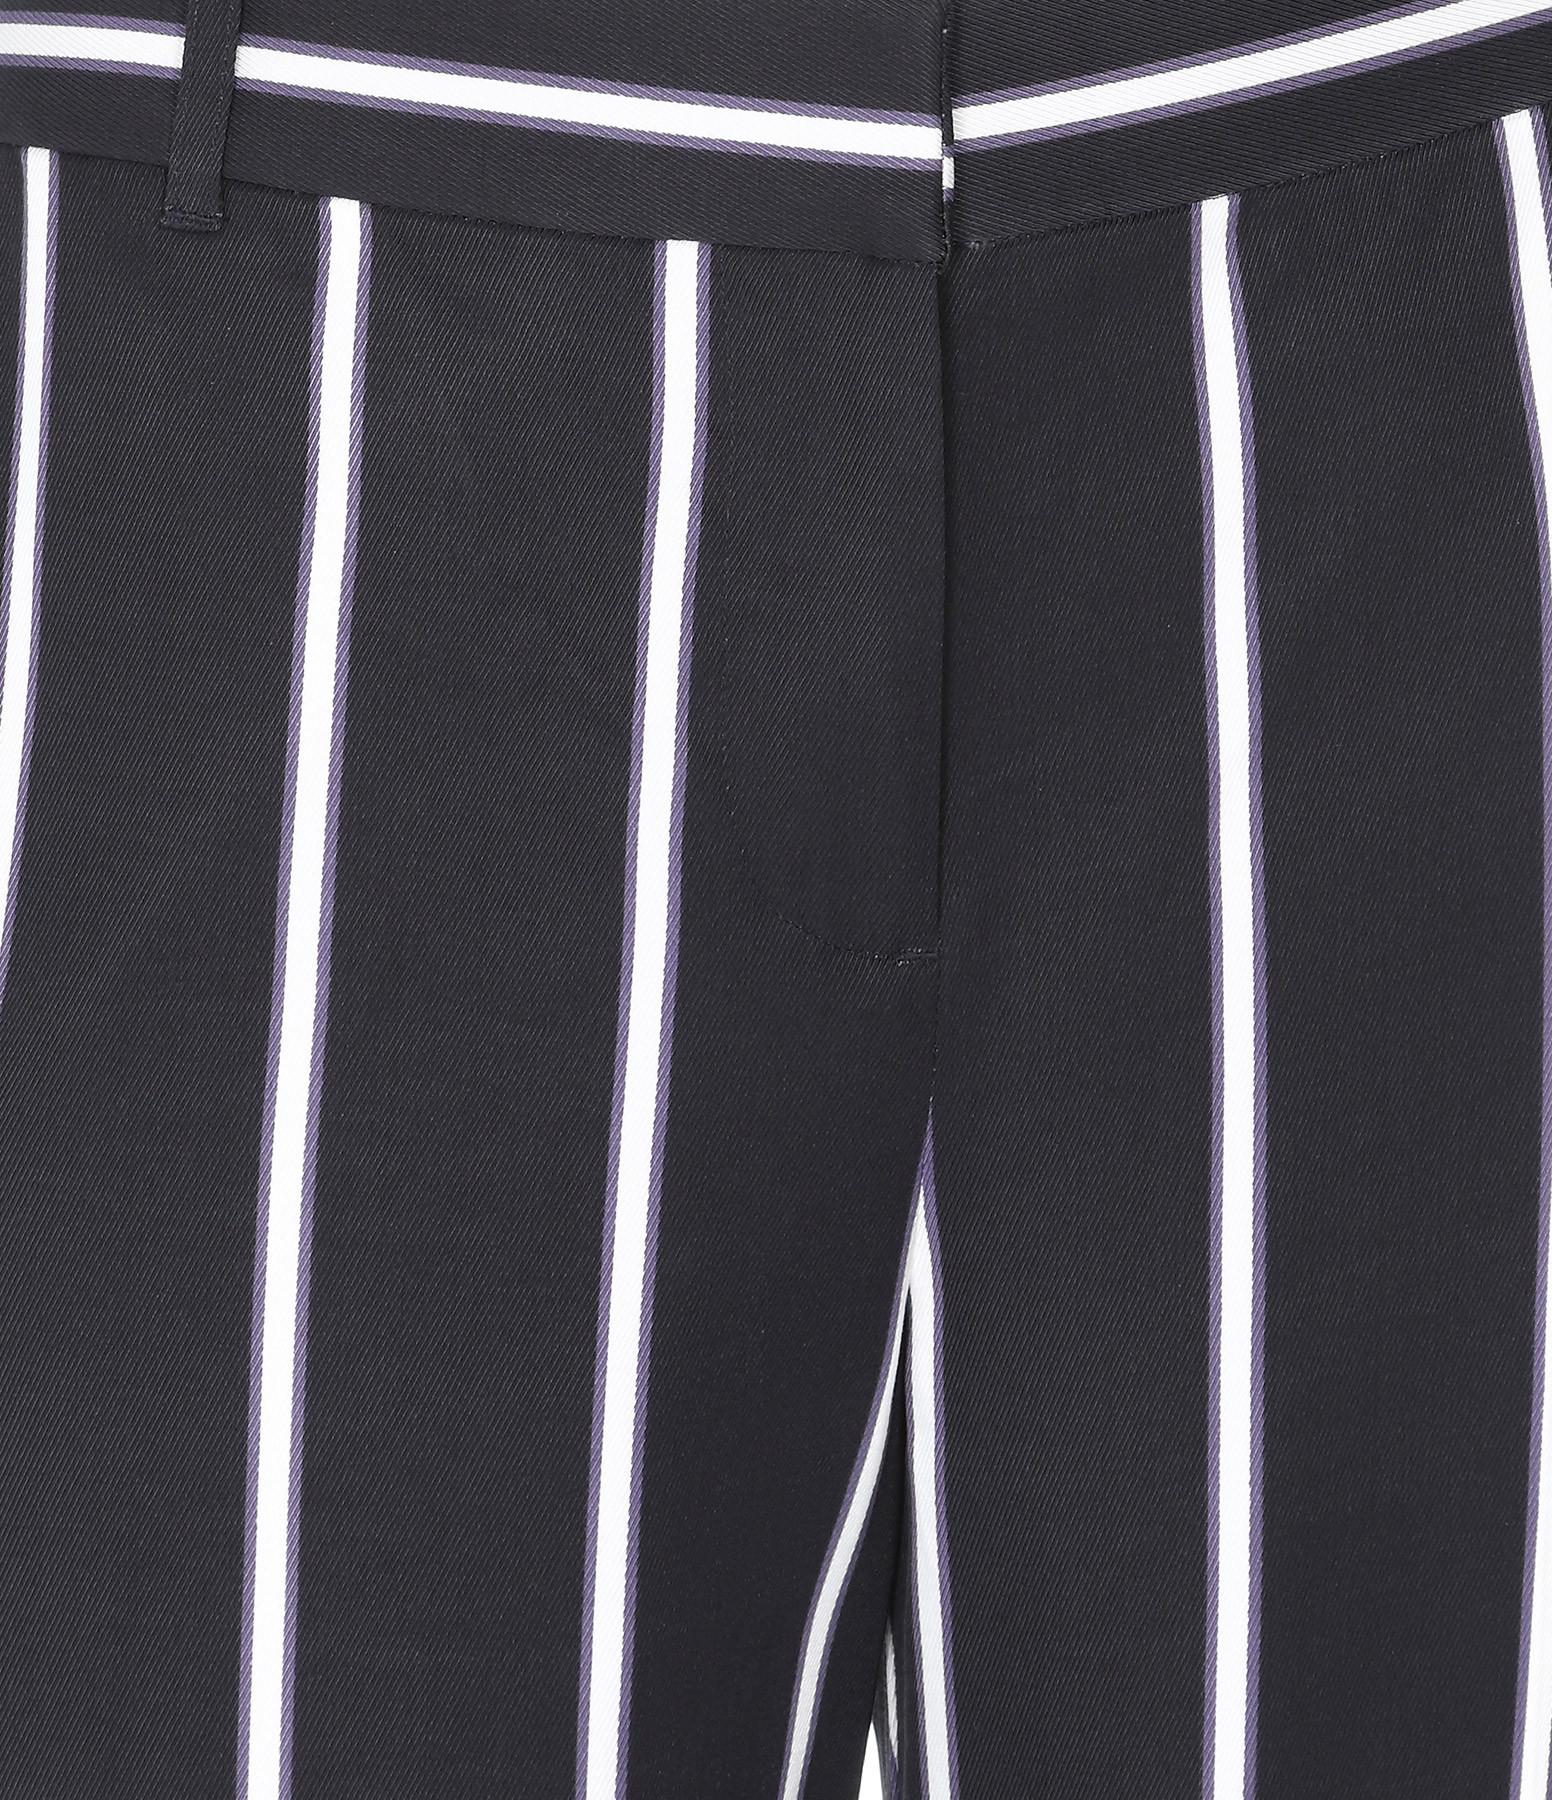 EQUIPMENT - Pantalon Rayures Arwen Noir Violet